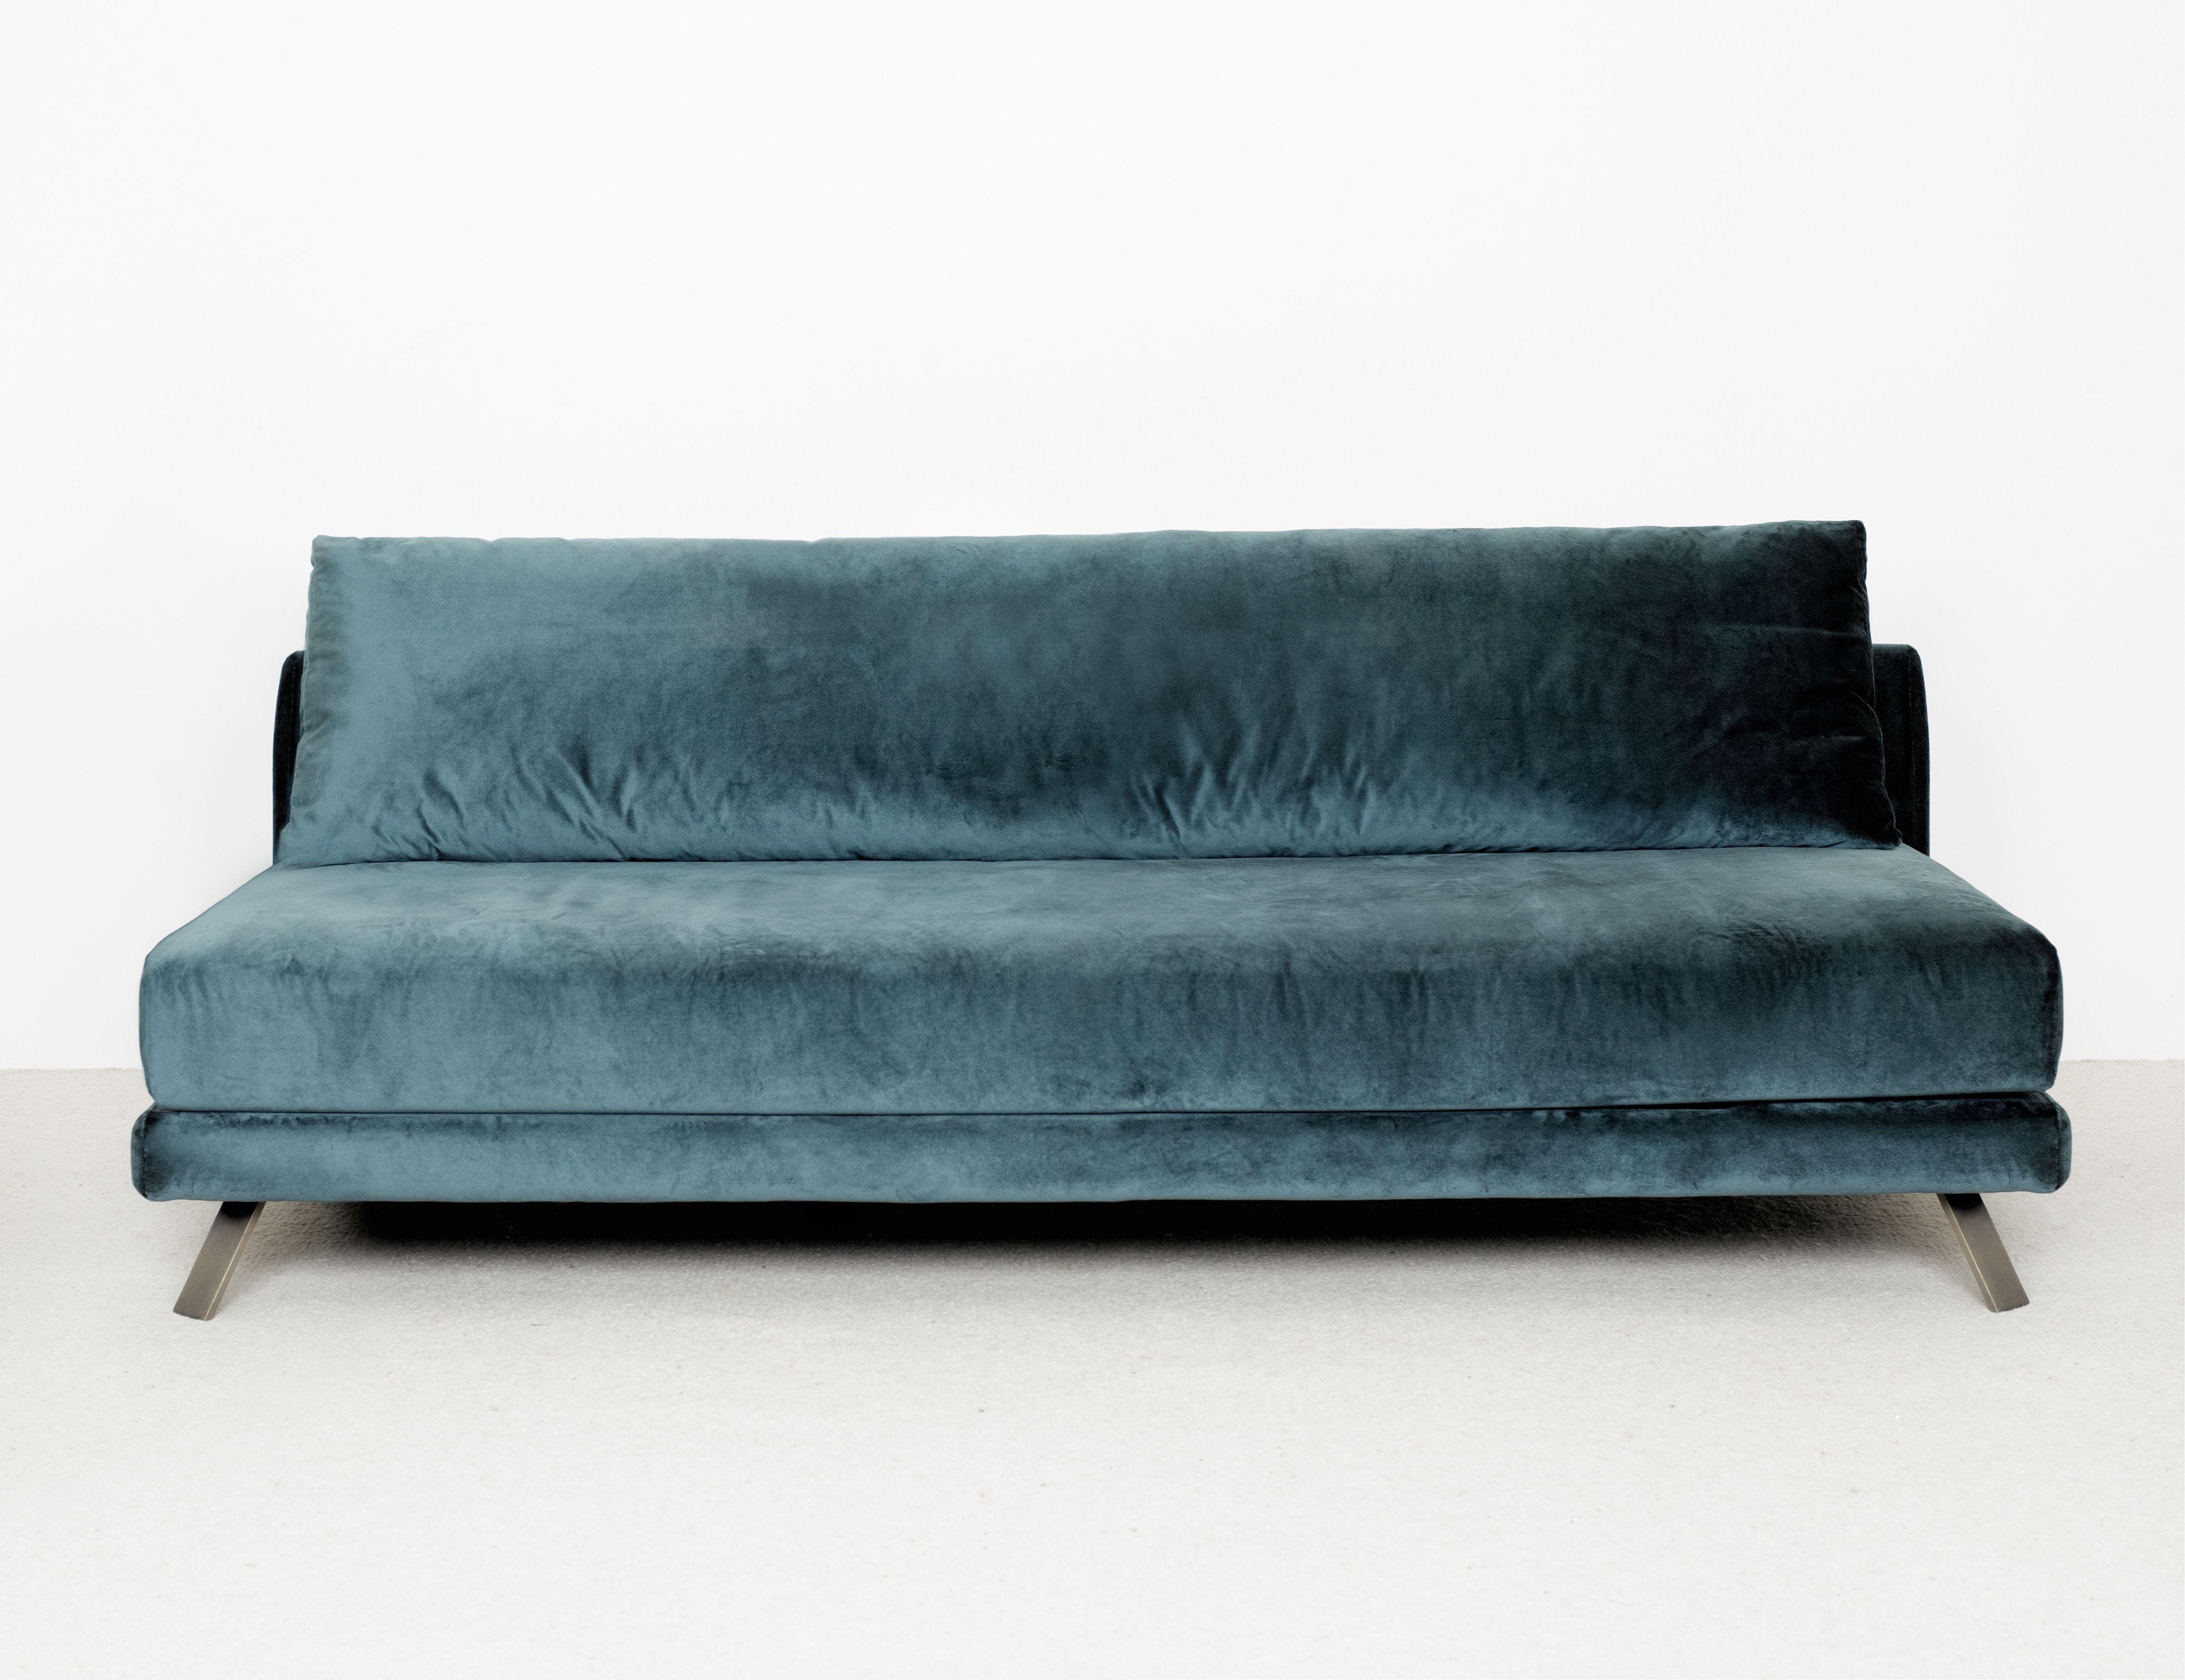 bob sofa christophe delcourt leather sleeper sectional archello ralph pucci sofas